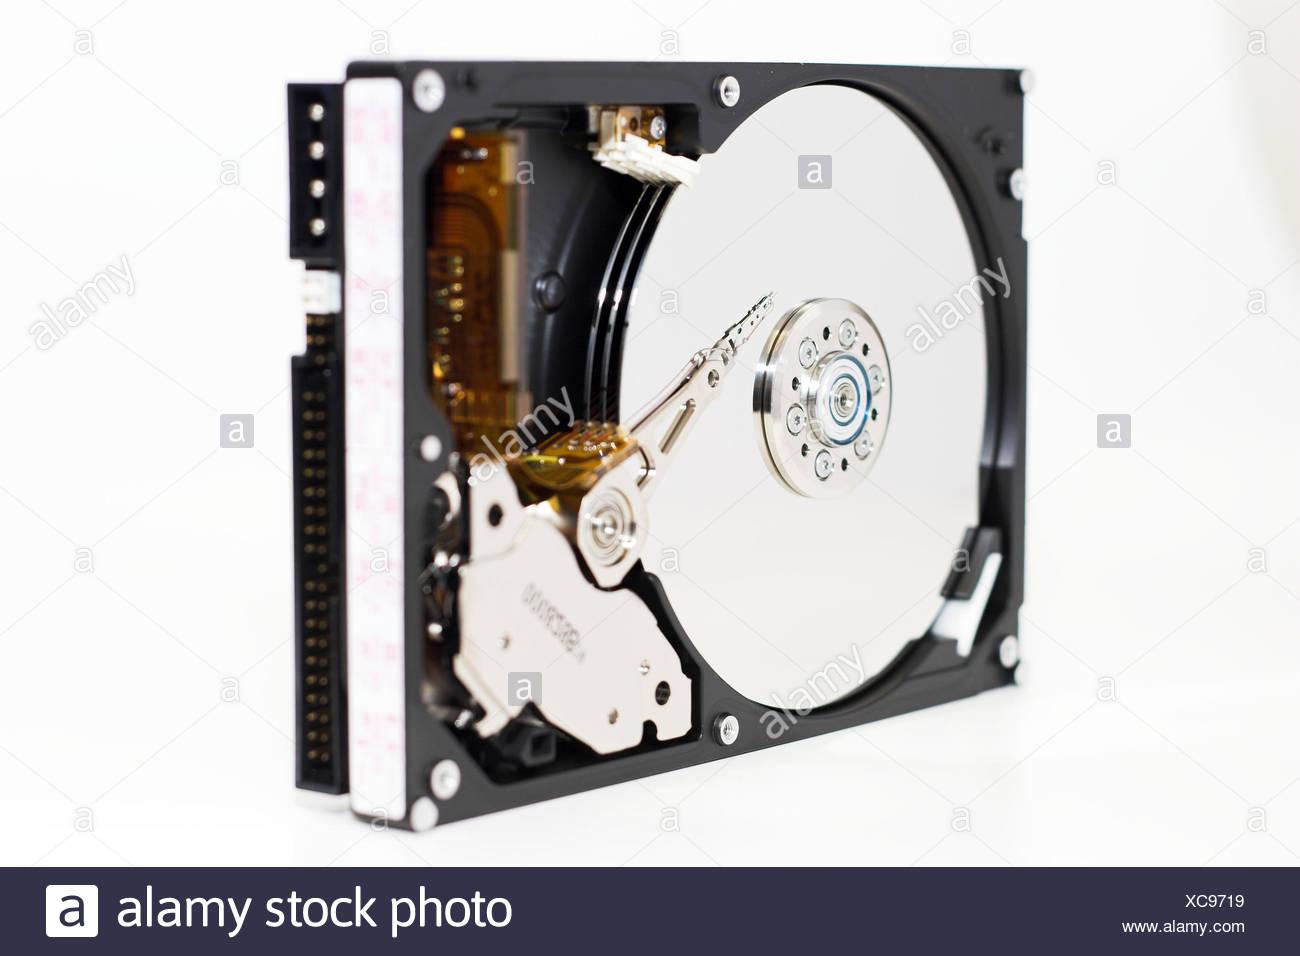 virtual memory memory ram discs magnet rotation diskette rotate magnetic head Stock Photo